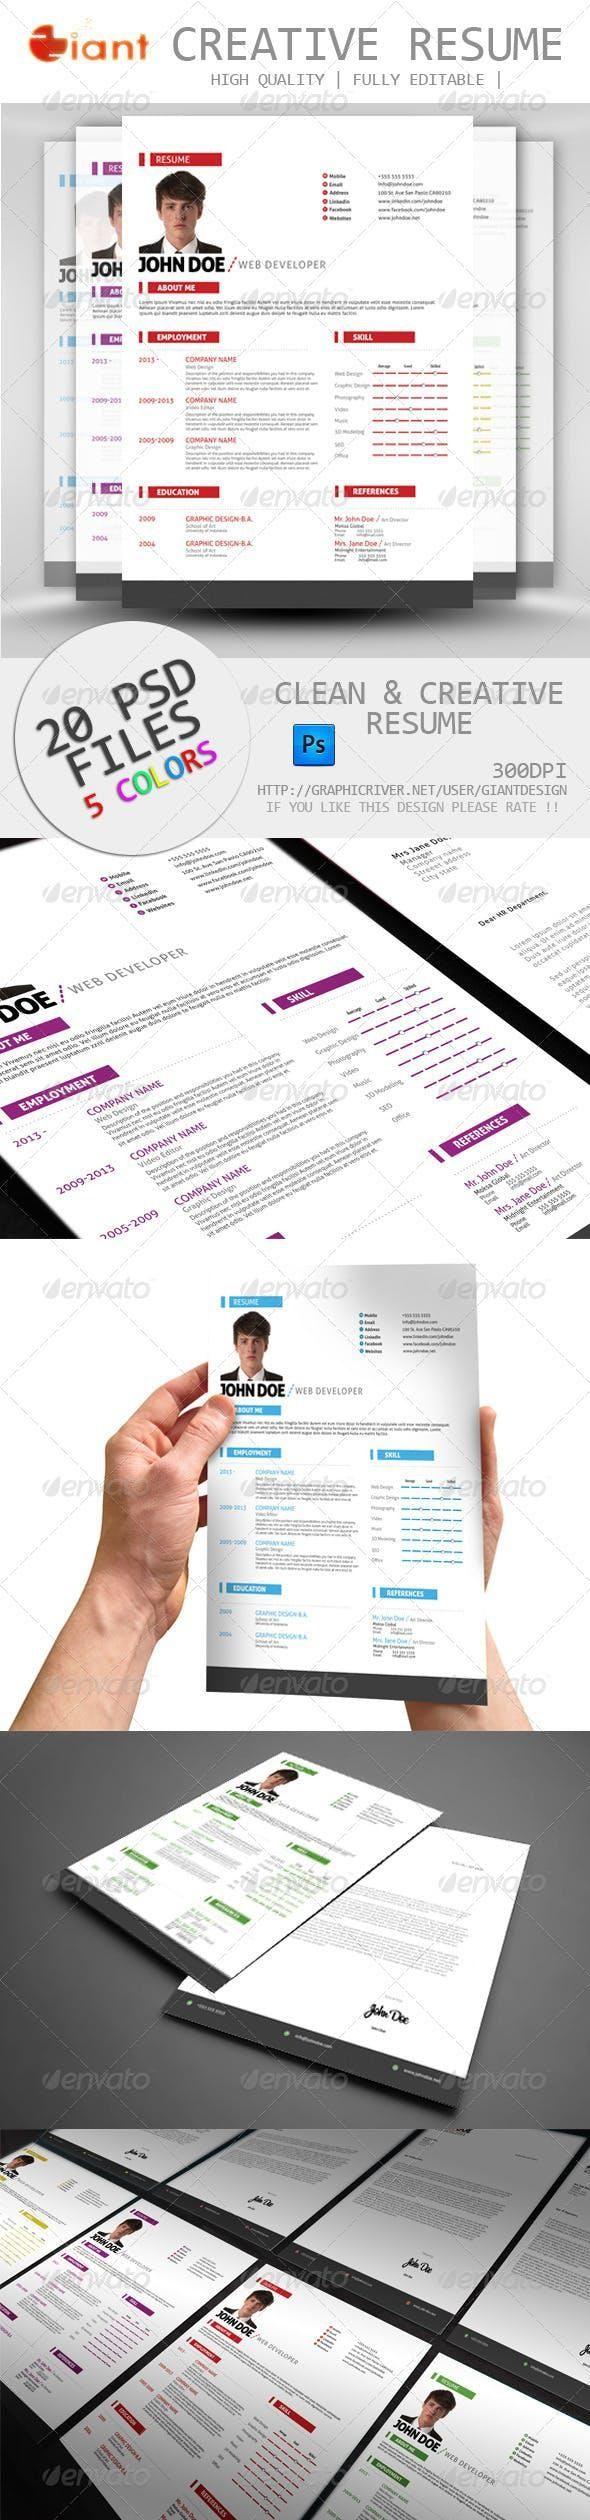 Simple Resume CV Cover Letter   Cv cover letter, Simple ...